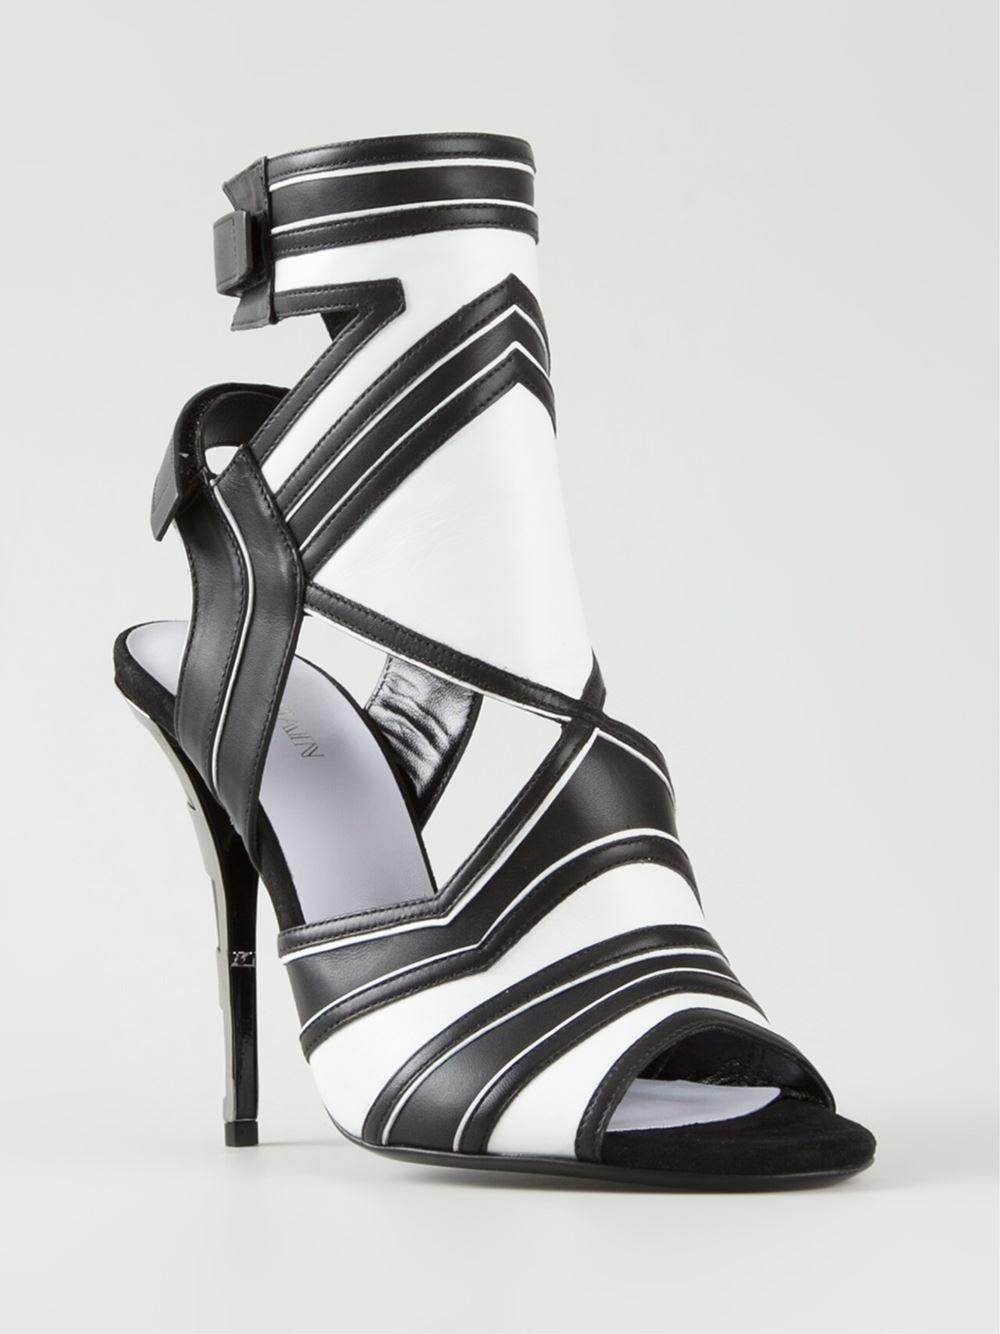 82ce1654234 Lyst - Balmain Strappy Sandals in Black